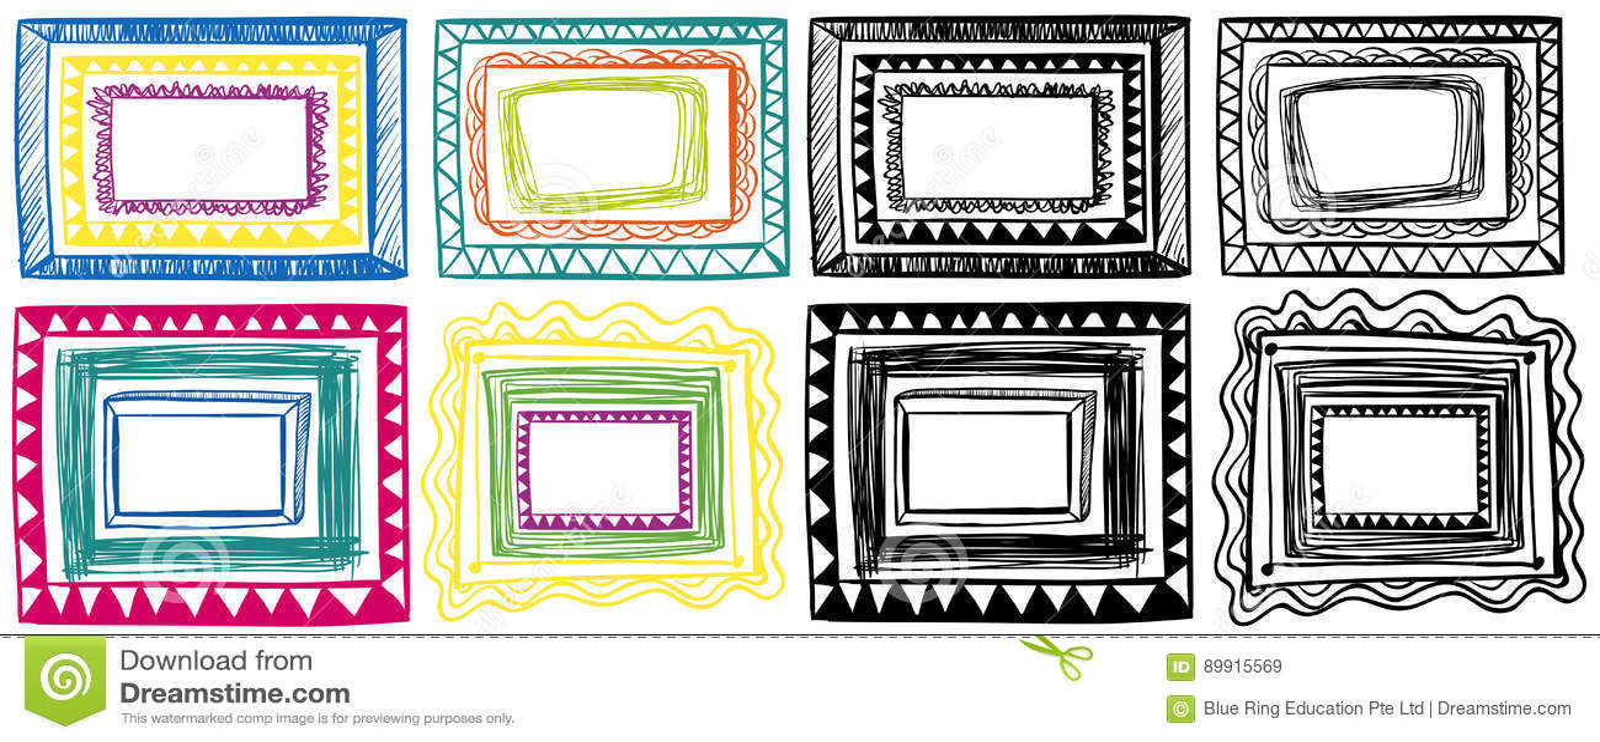 Different Doodles Of Frame Designs Stock Vector - Illustration of ...